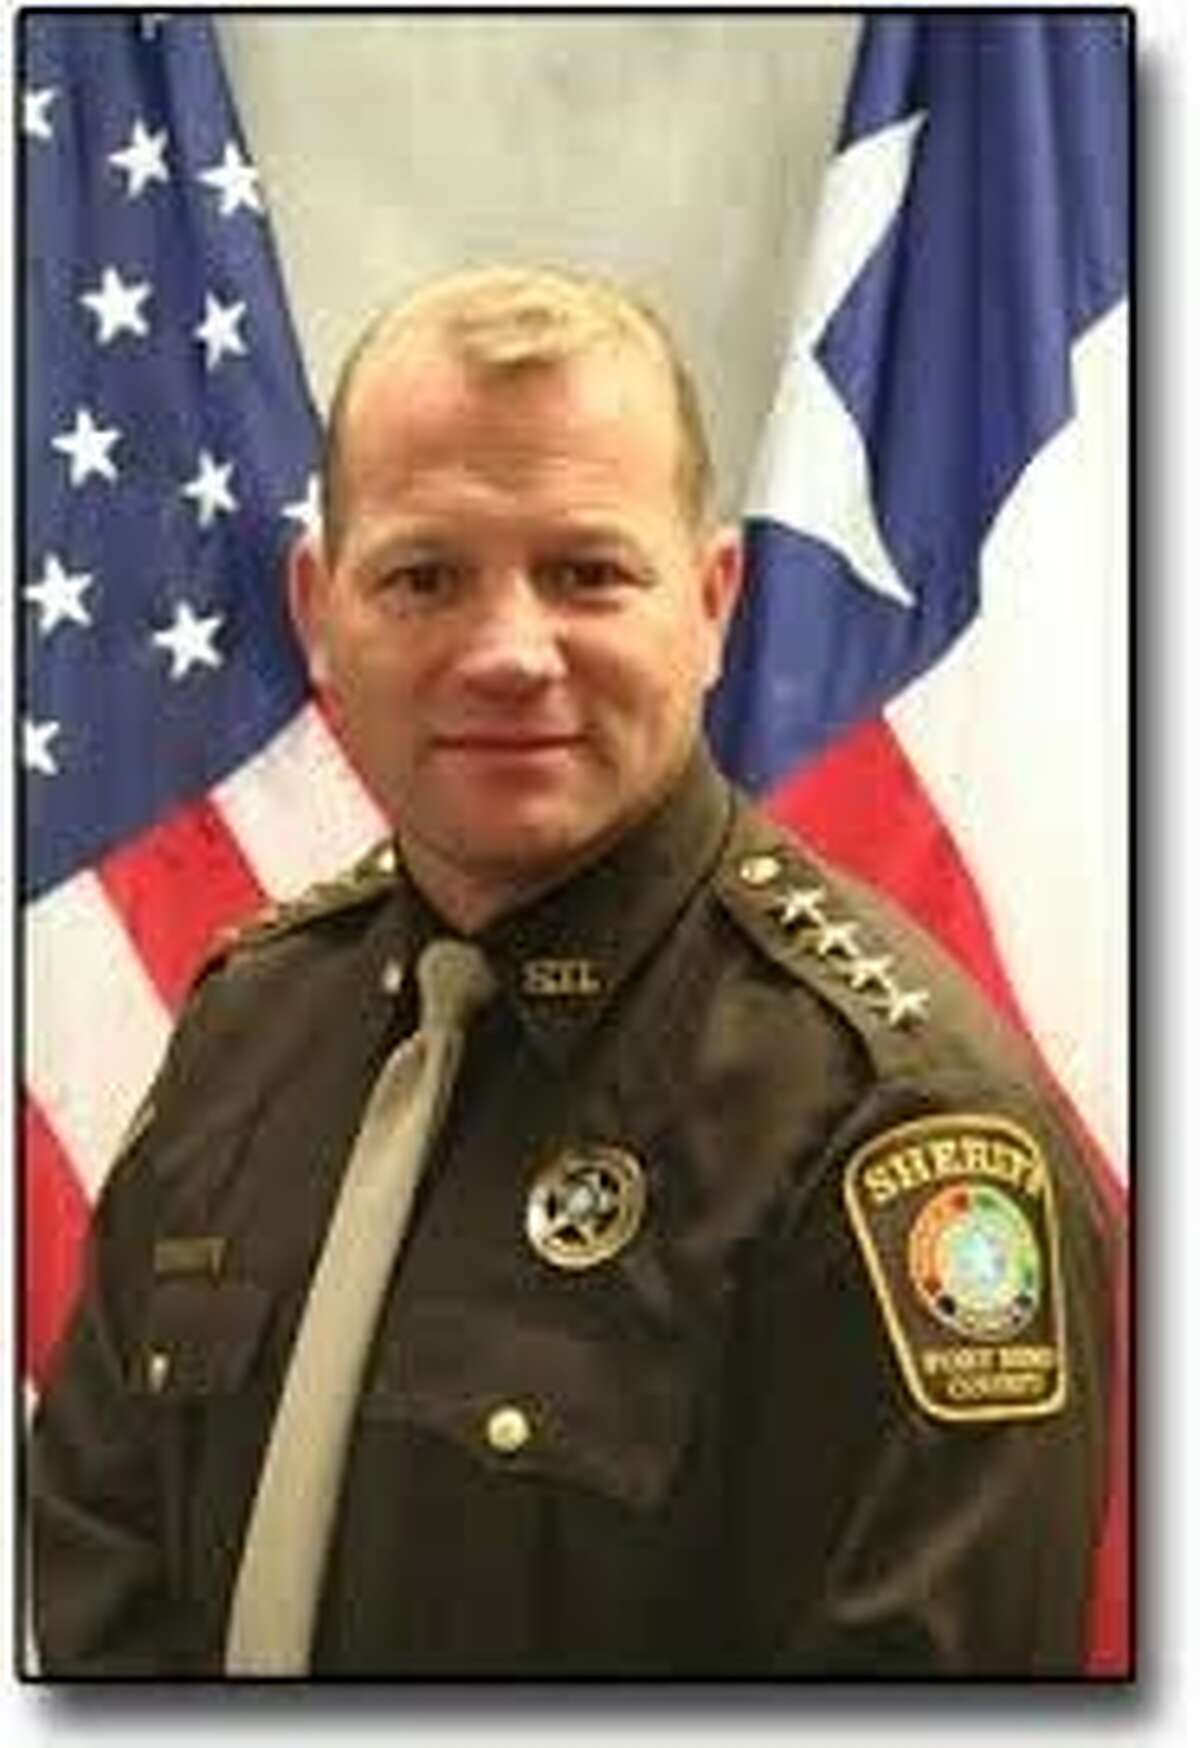 Fort Bend County Sheriff Troy E. Nehls